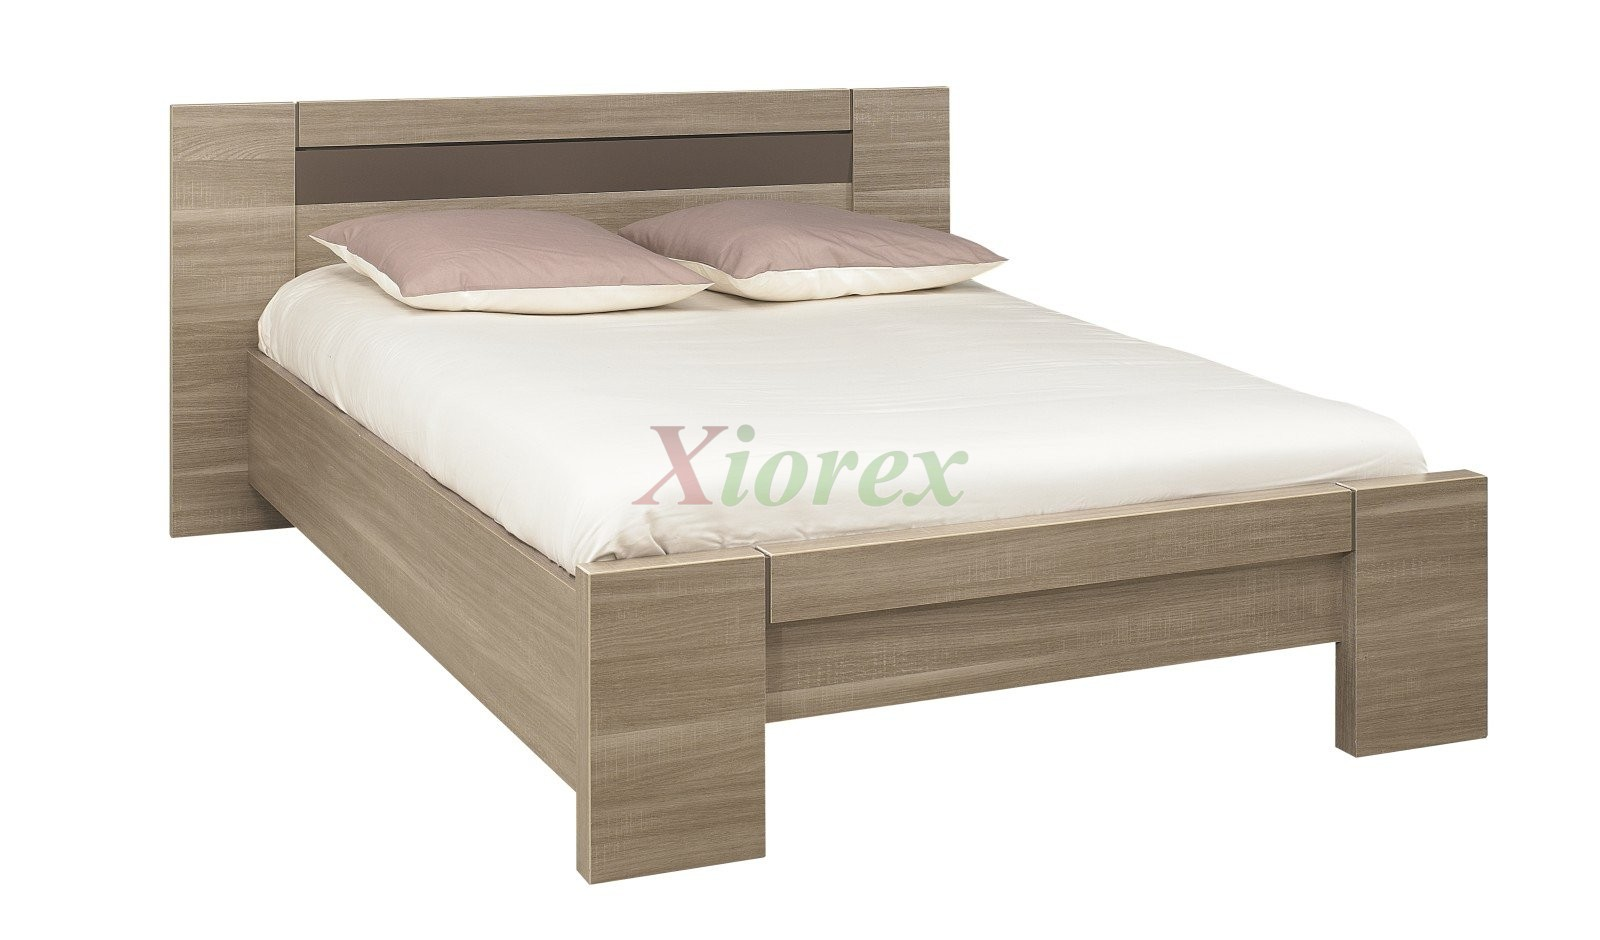 Lit gami pour related un enfant tissu angle avec idees for Ikea pleine taille futon